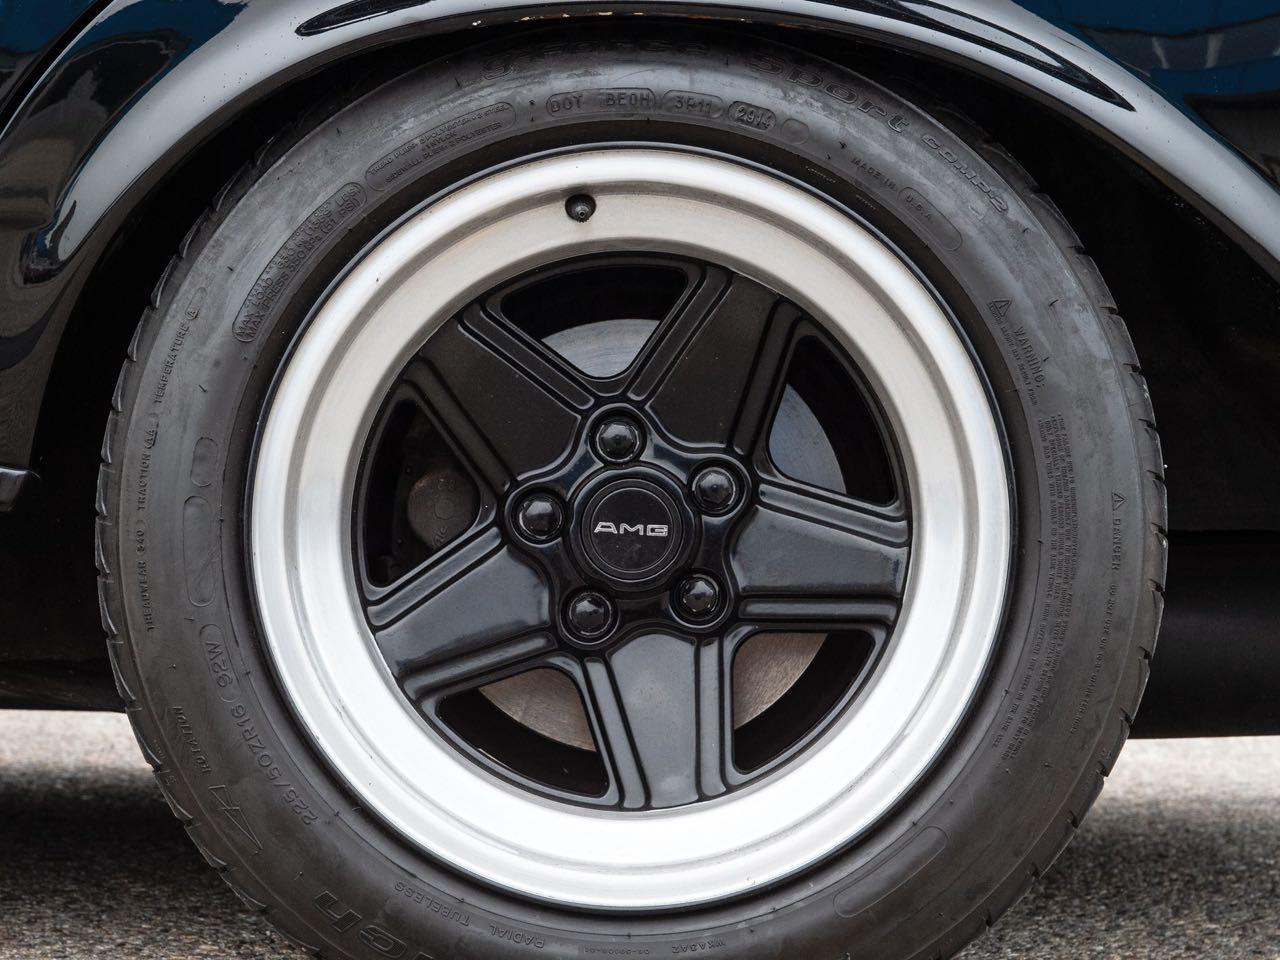 '79 Mercedes 500 TE AMG W123... Sexy lady ! 14